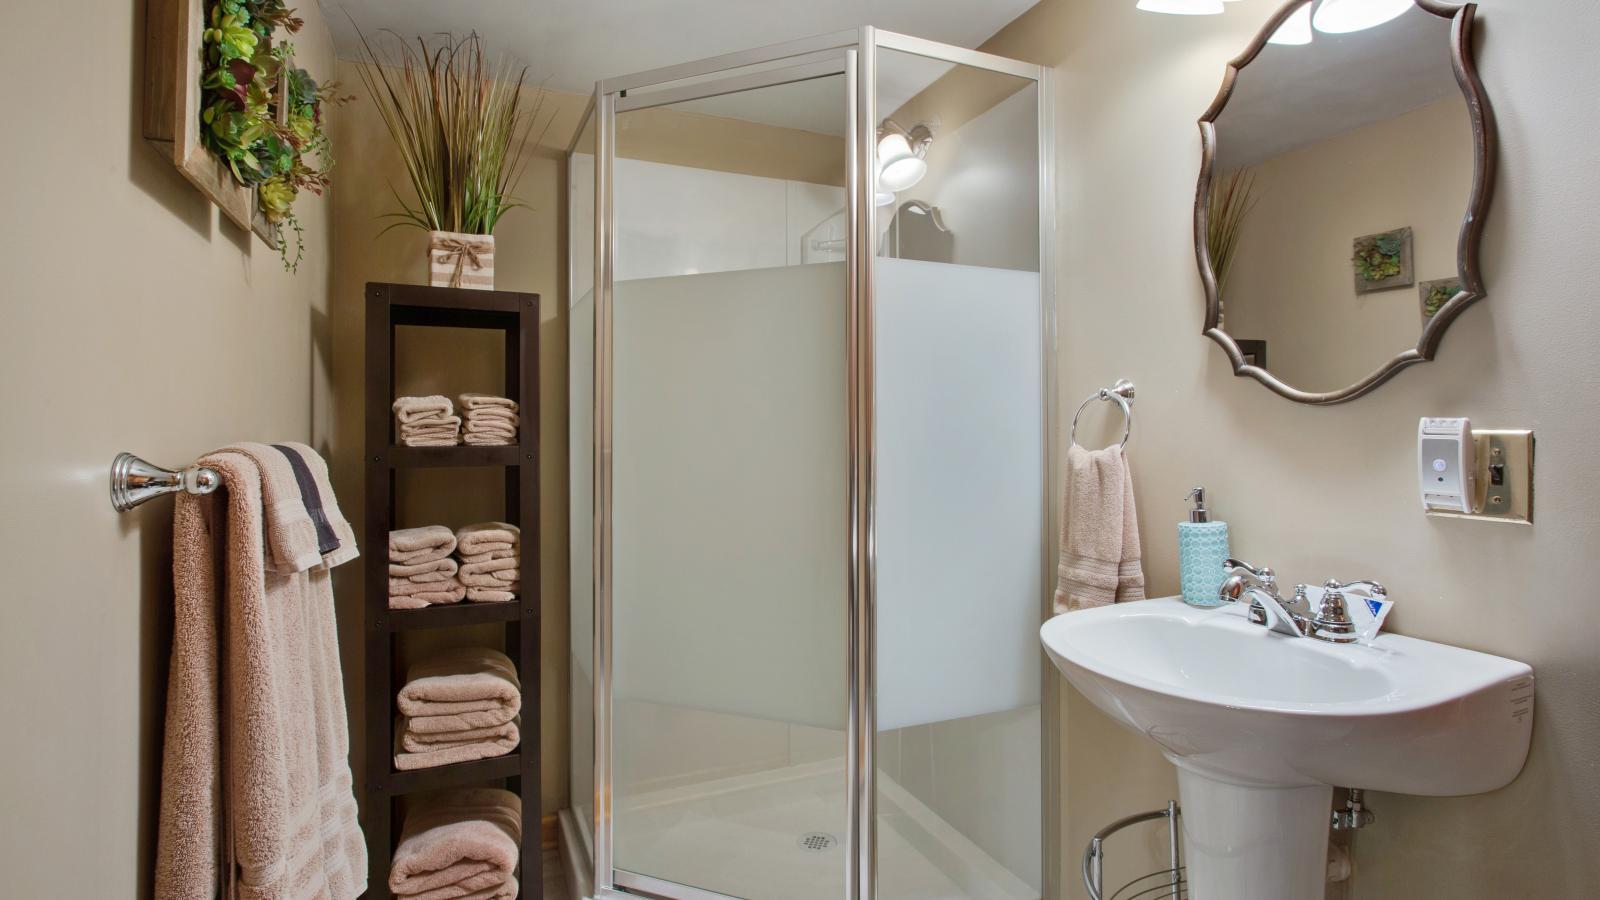 Bathroom shower and sink